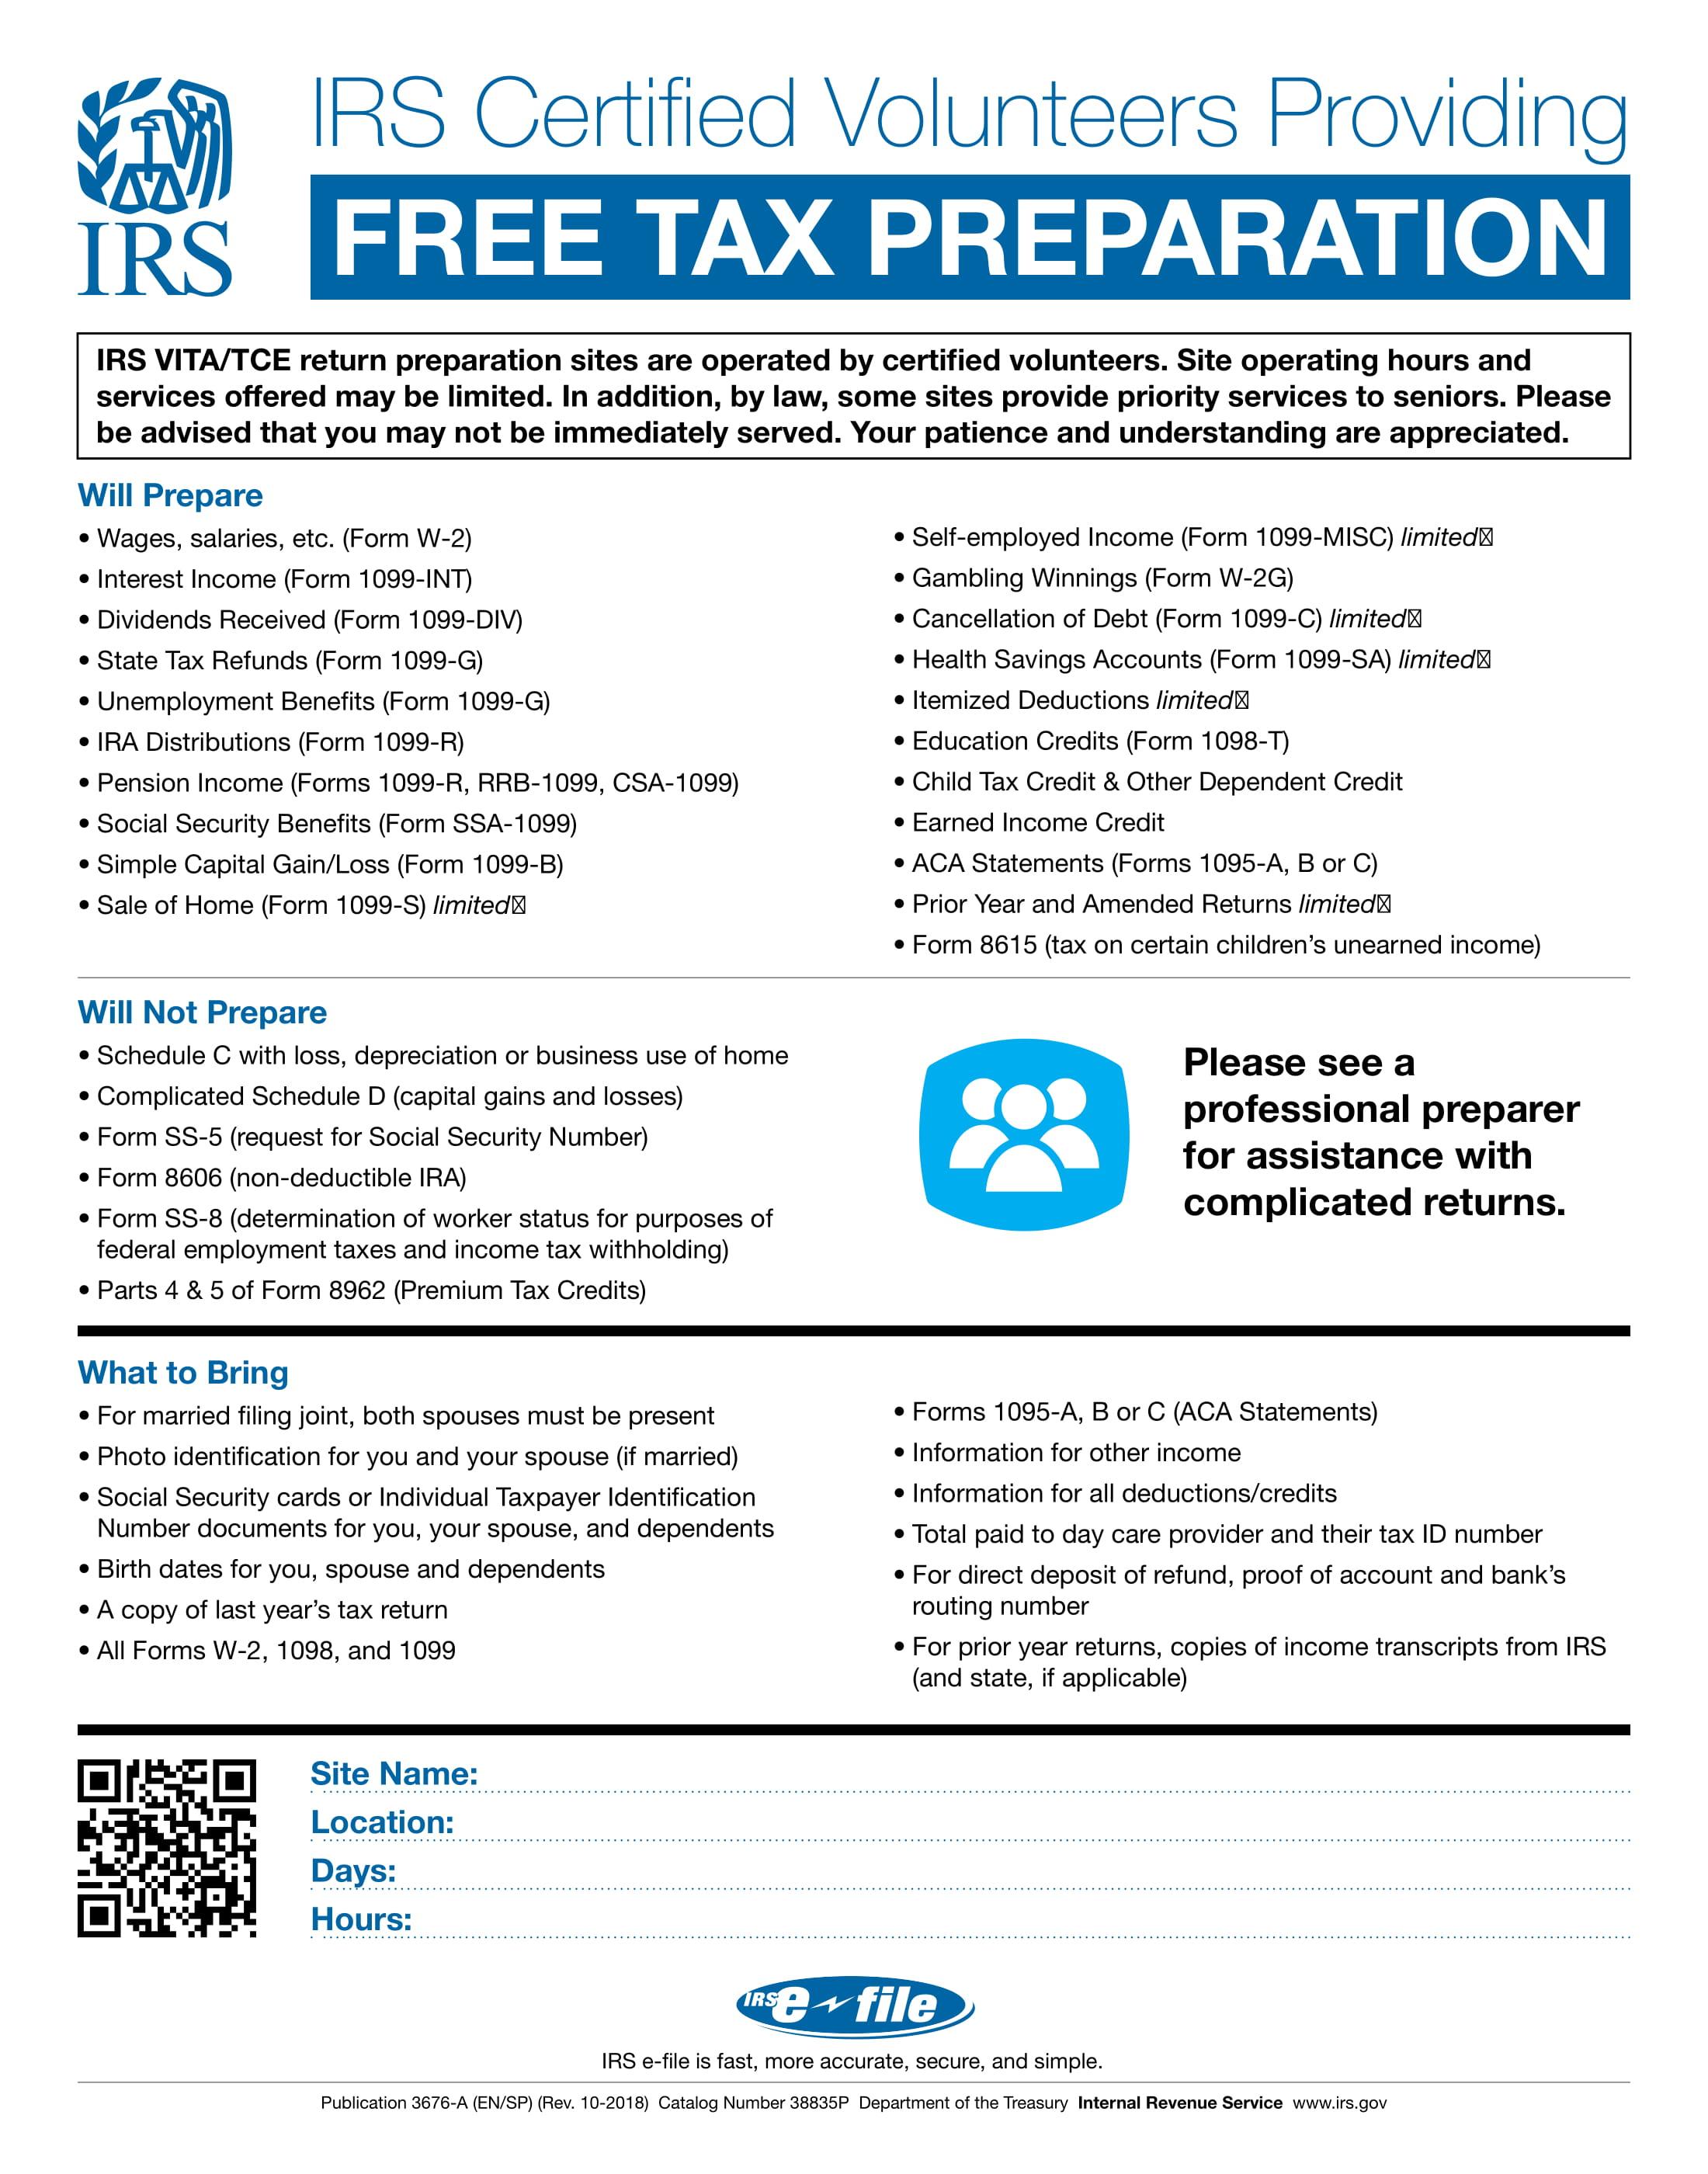 Scope of Services VITA IRS-1.jpg